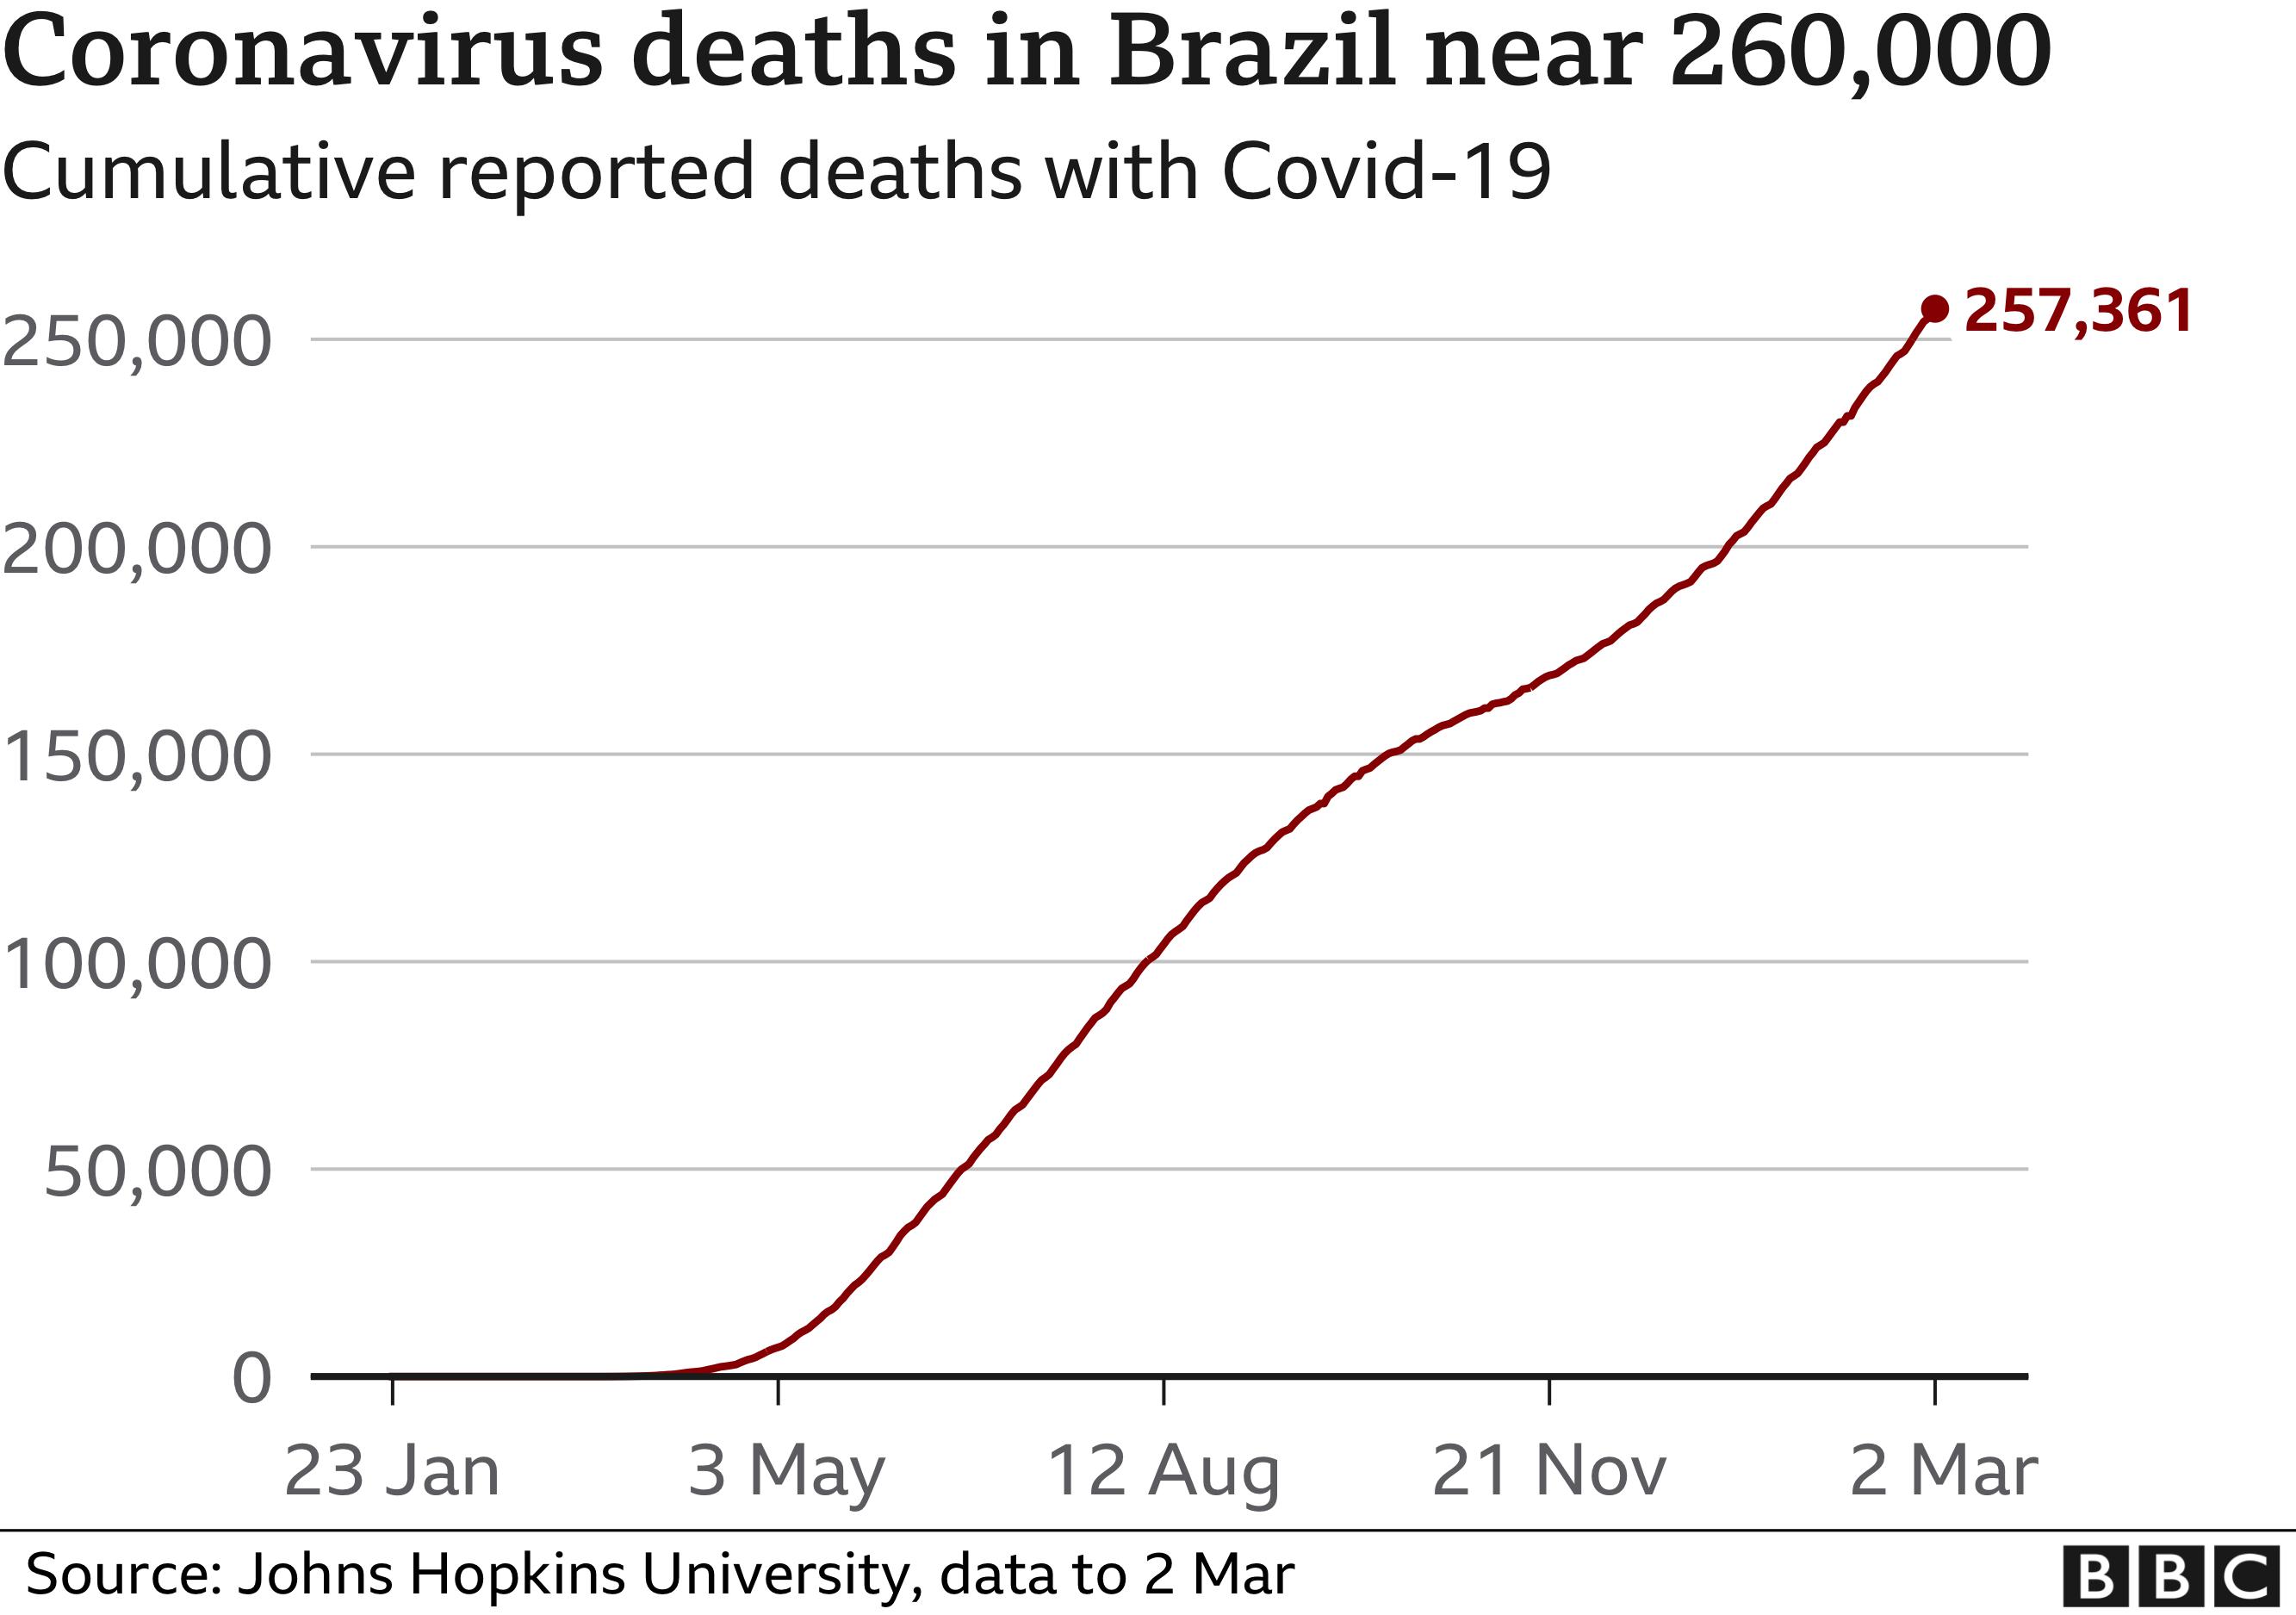 Chart showing cumulative deaths